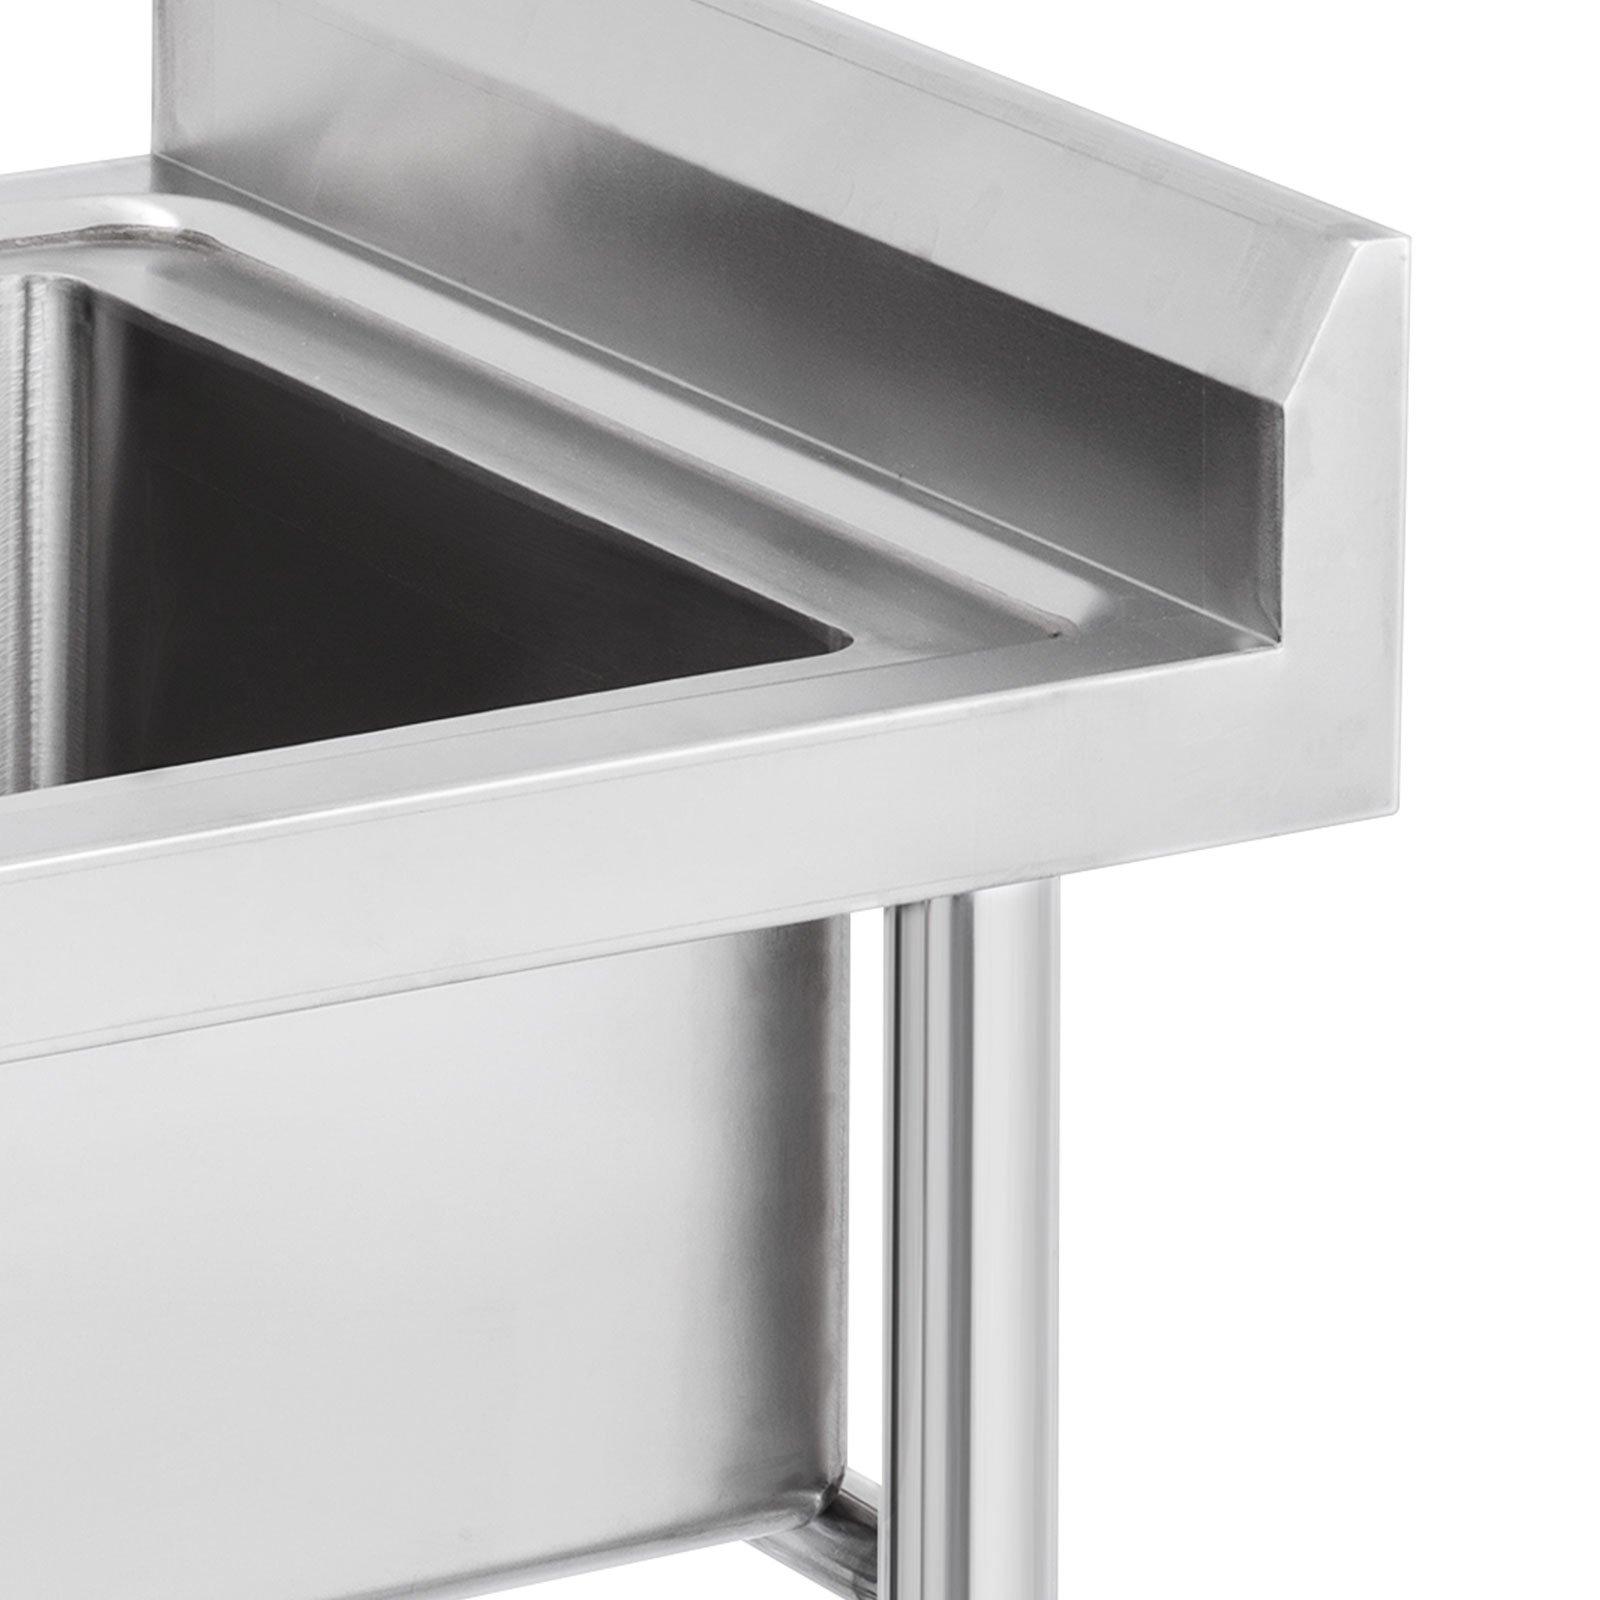 "Mophorn 2 Compartment Stainless Steel Bar Sink 15.5"" x 16.5""Bowl Size Handmade Underbar Sink for bar, kitchen restaurant by Mophorn (Image #6)"